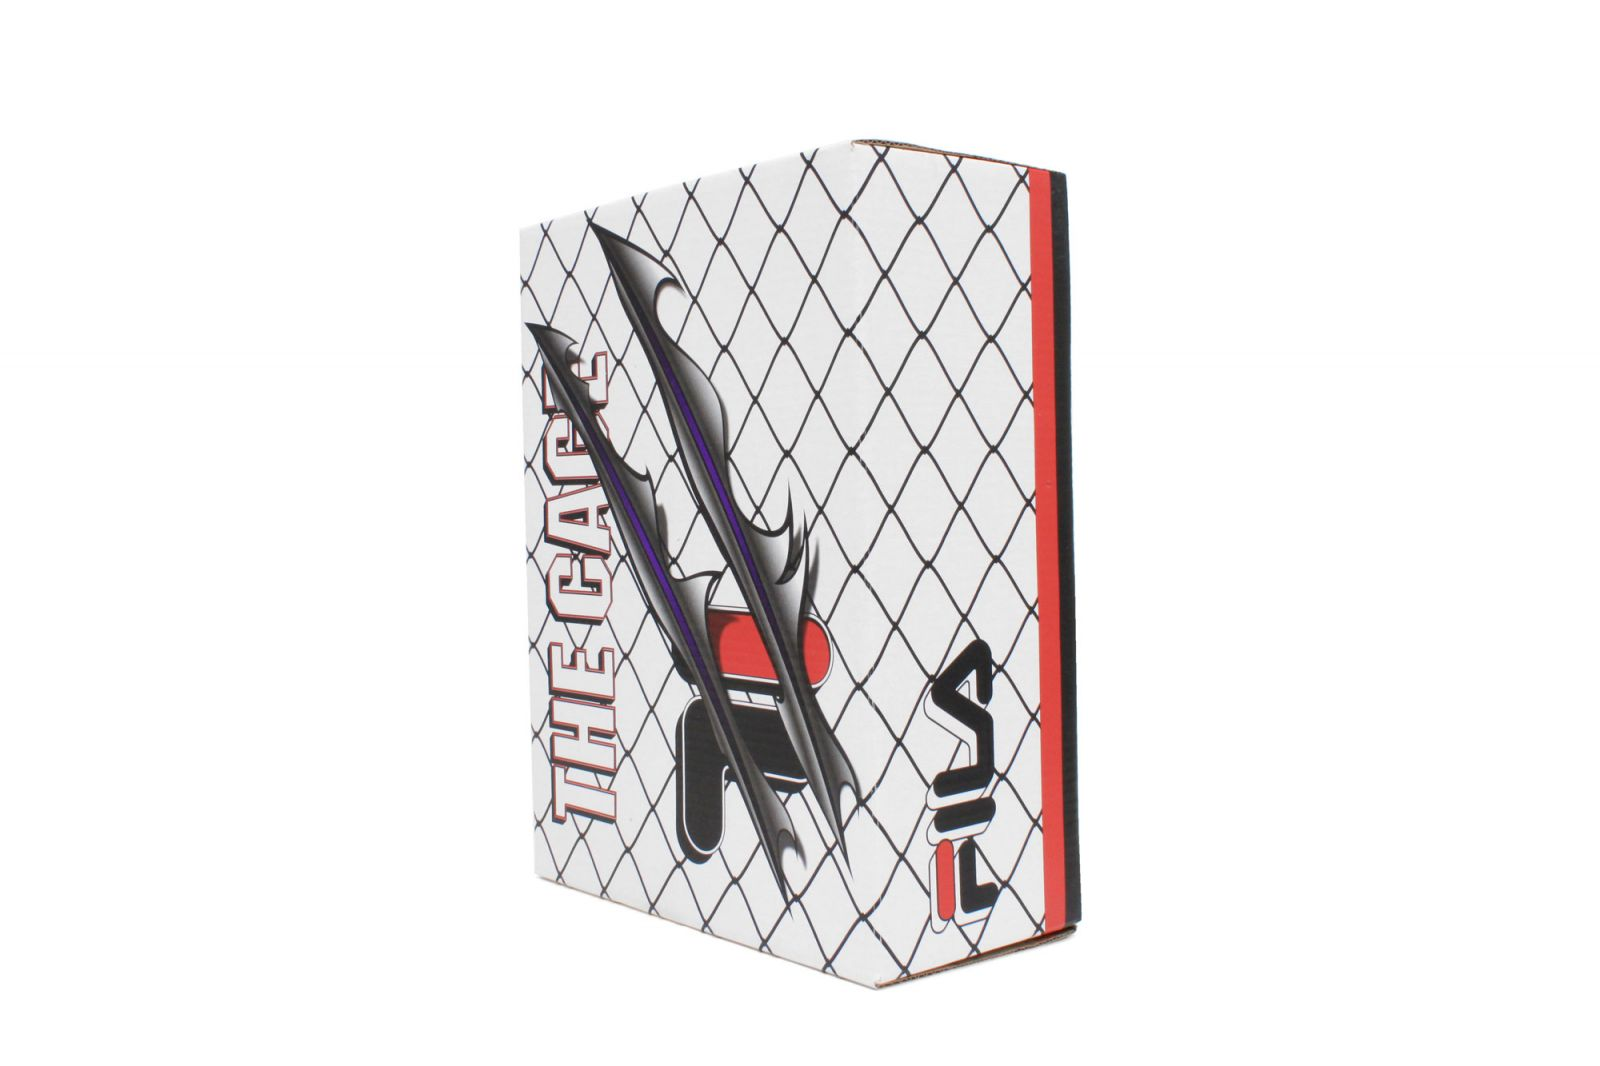 teenage-mutant-ninga-turtle-fila-cage-shredder-new-images-release-date-info-5